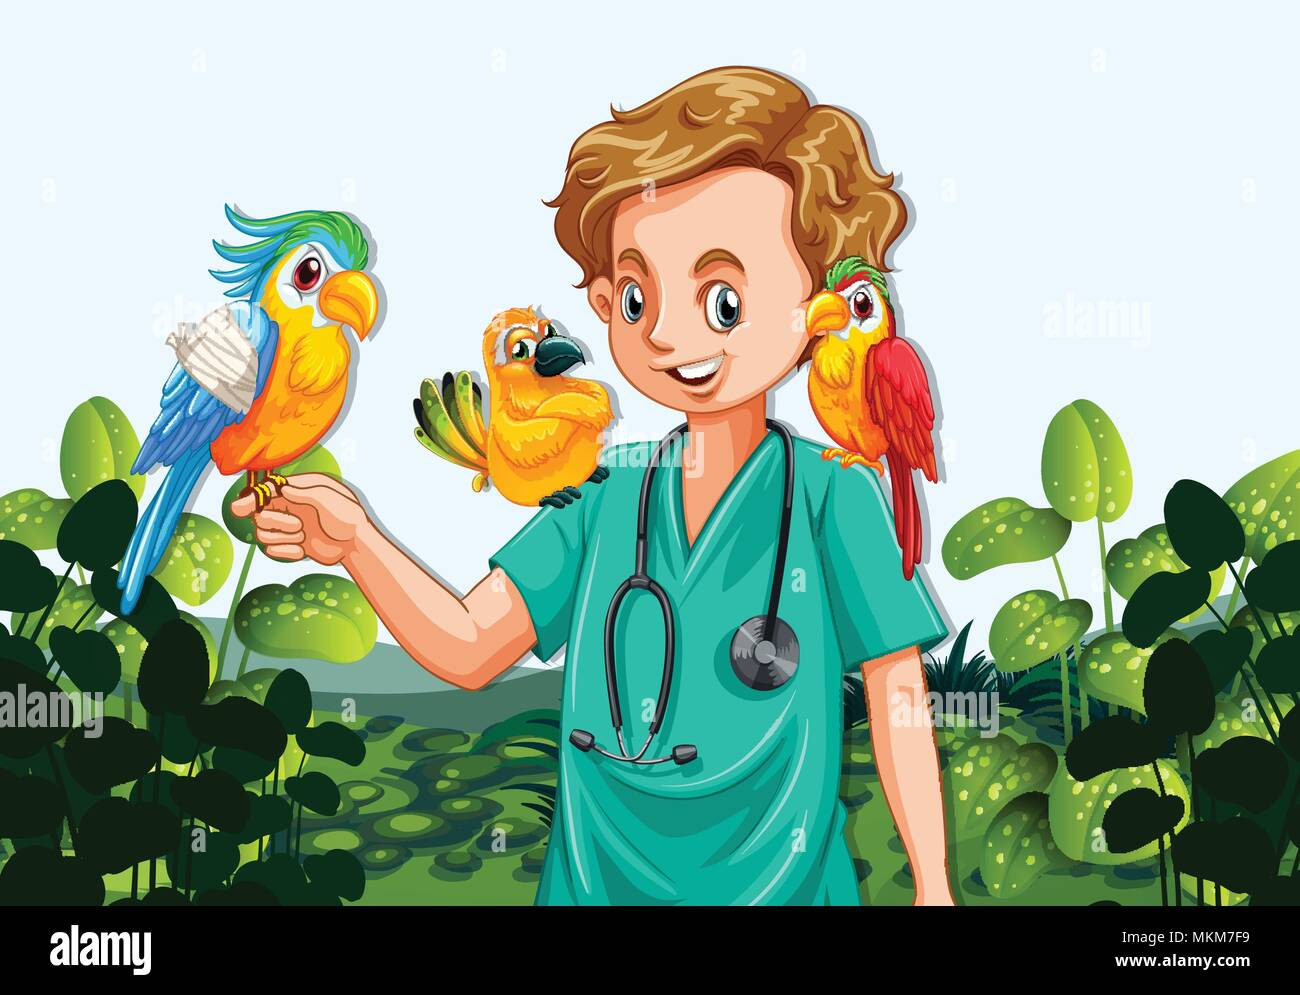 A Male Veterinarian Nurse and Parrots illustration - Stock Vector